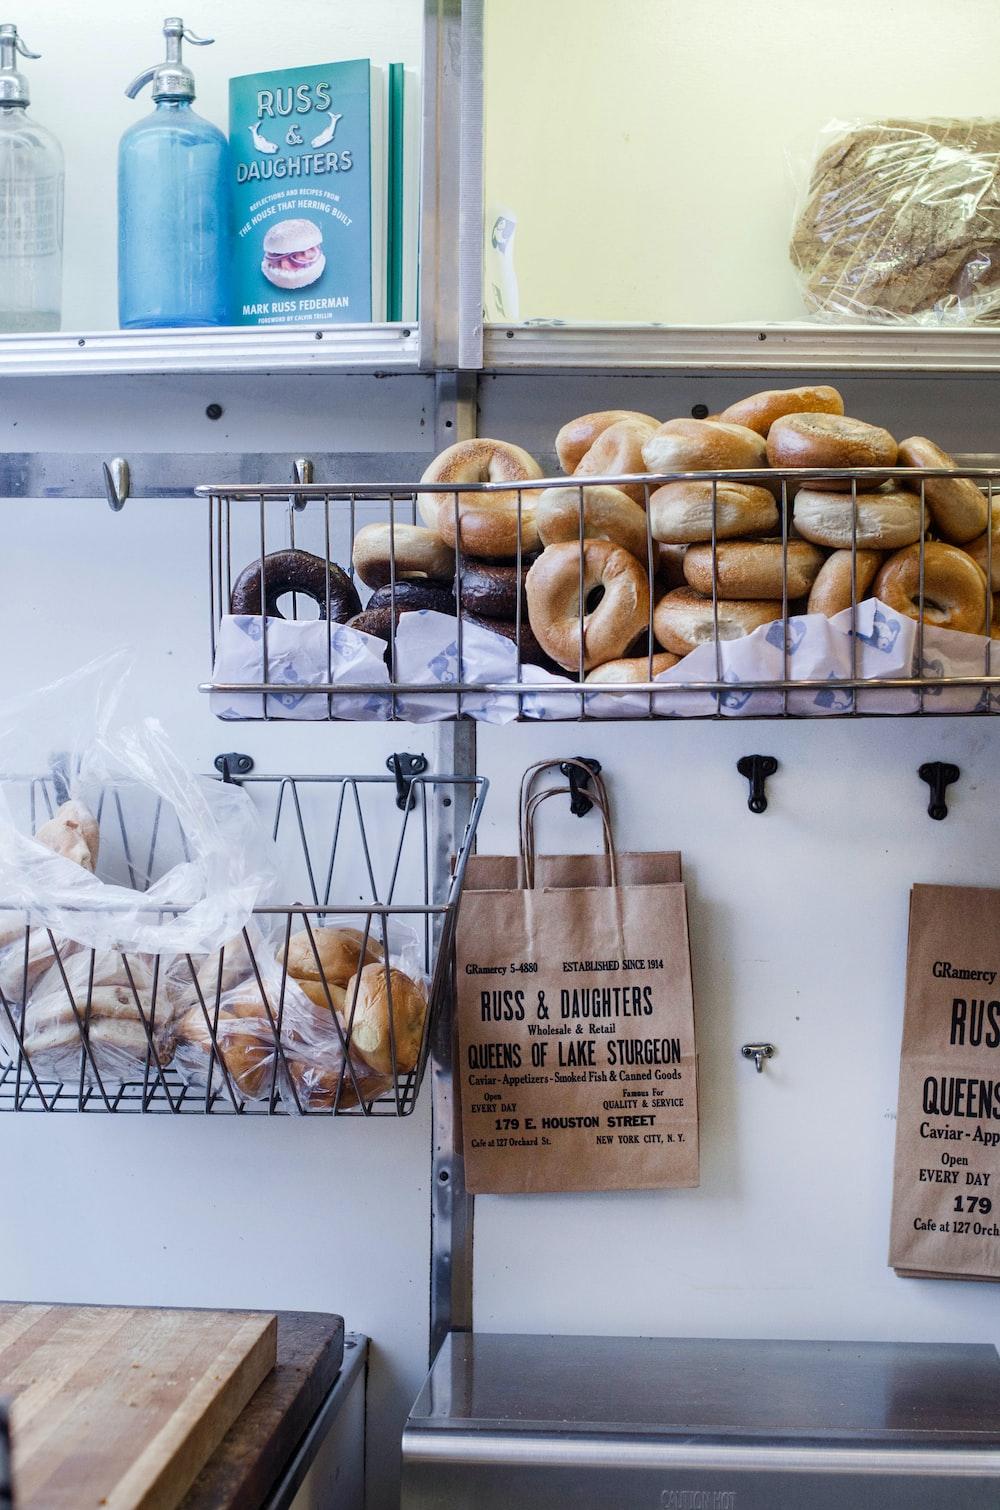 brown bread in white plastic bag